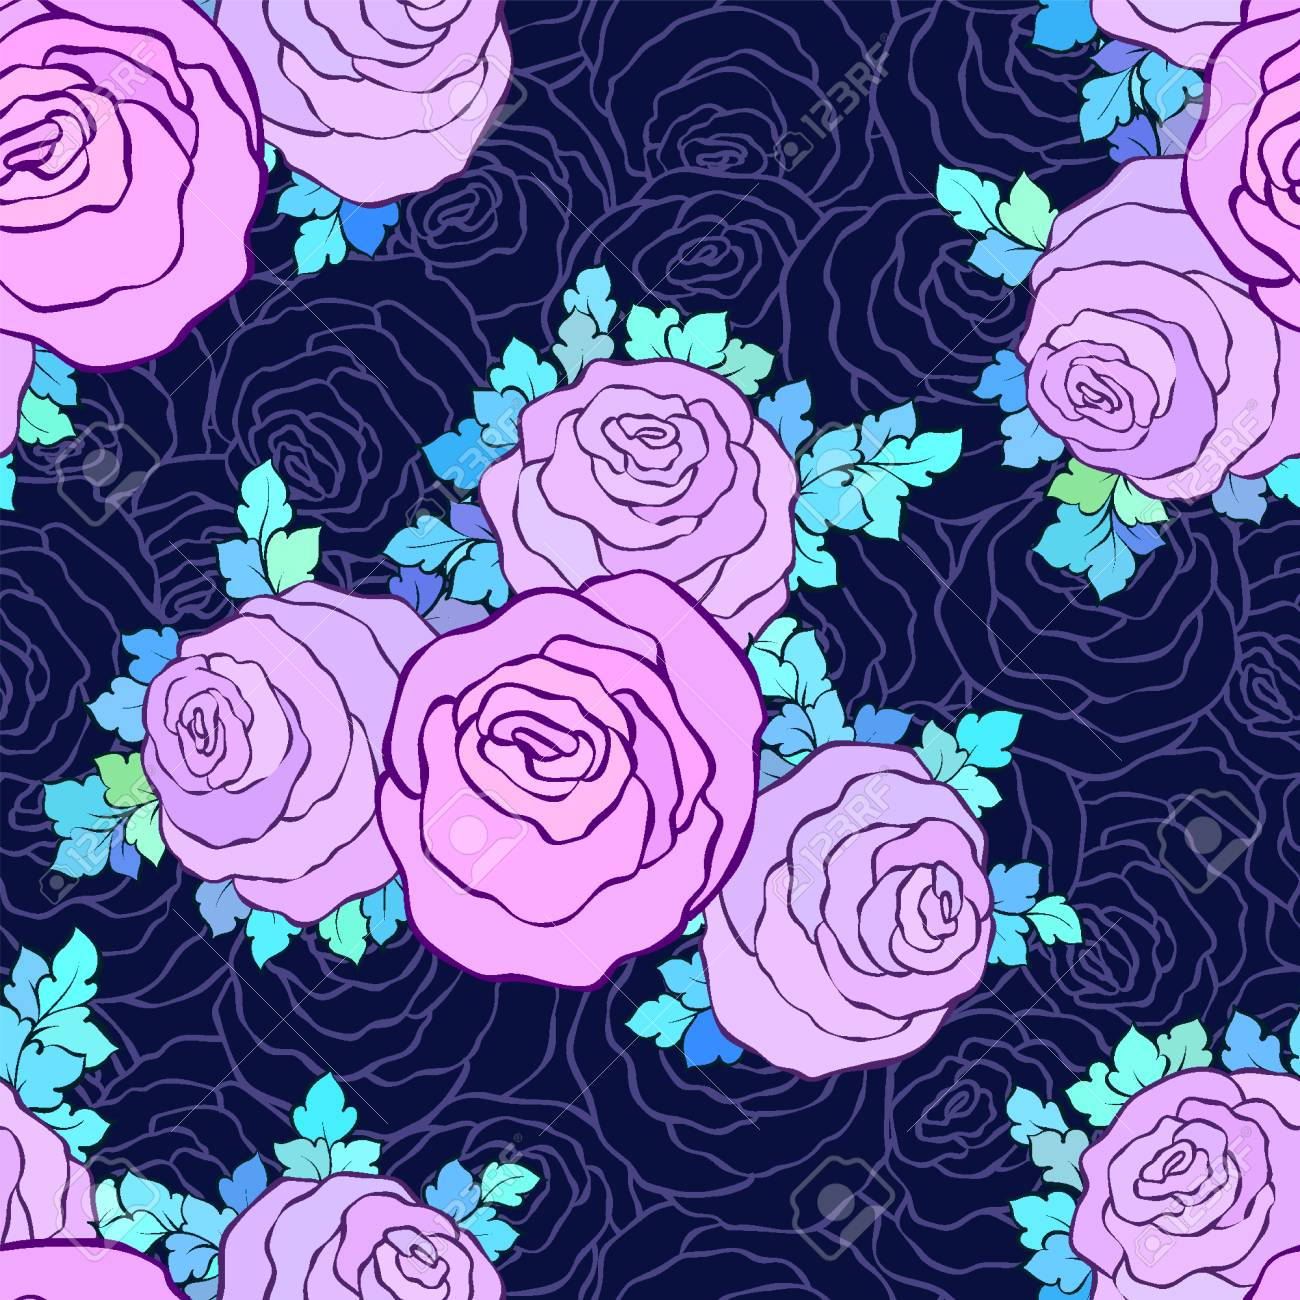 Vettoriale Carta Da Parati Decorativa Floreale Luminosa Con Rose